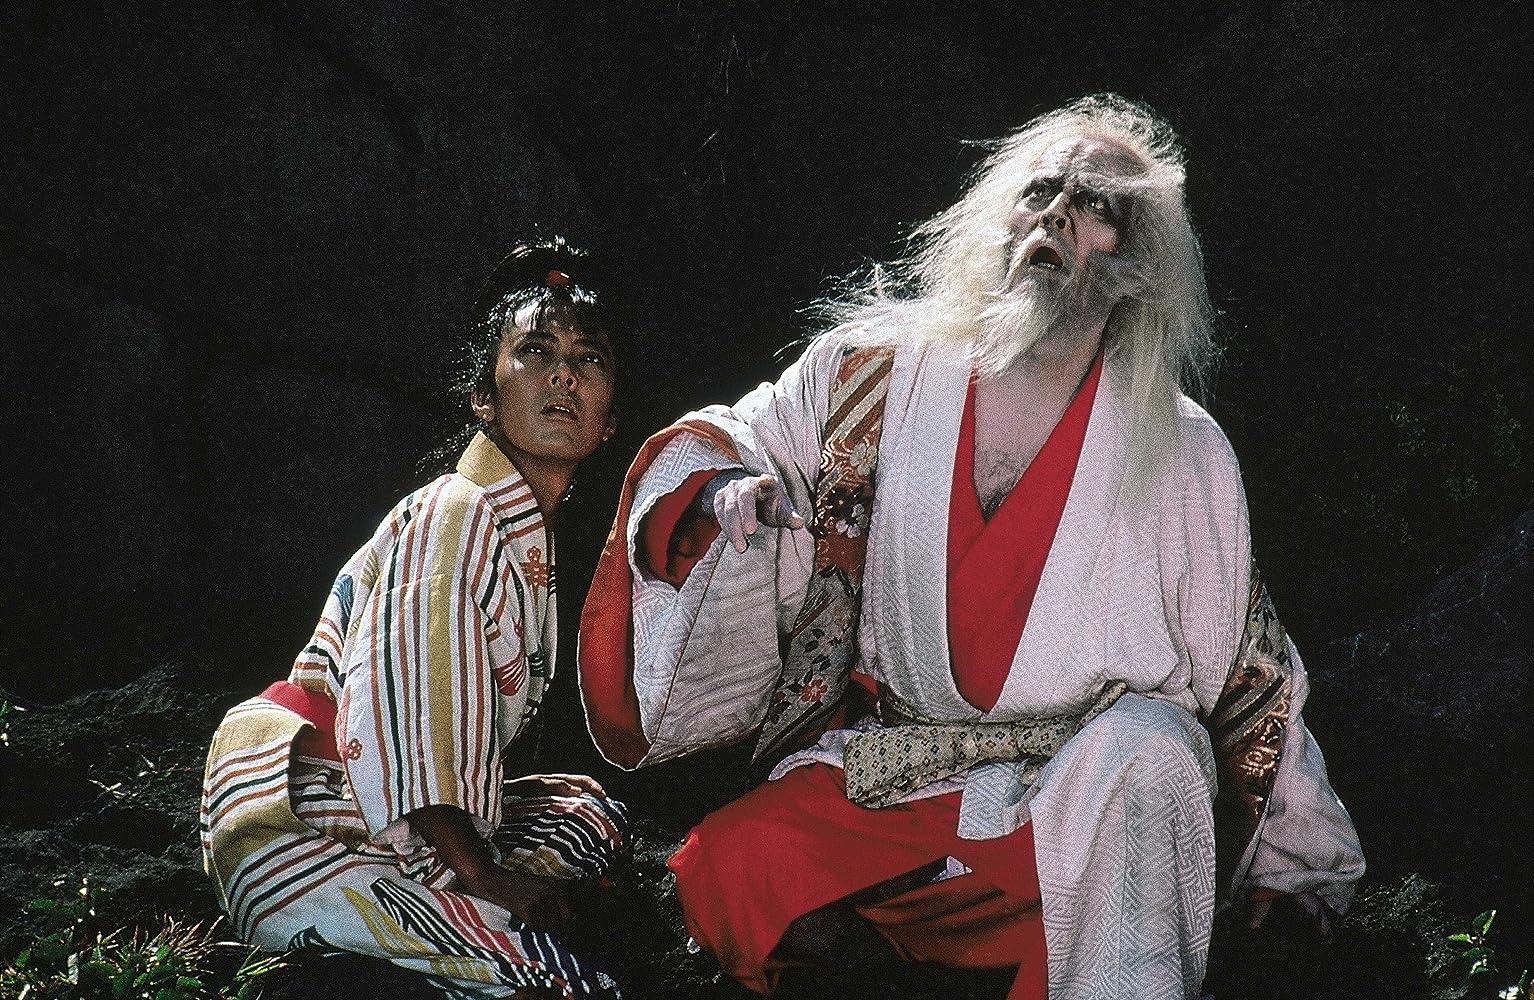 Tatsuya Nakadai and Pîtâ in Ran (1985)